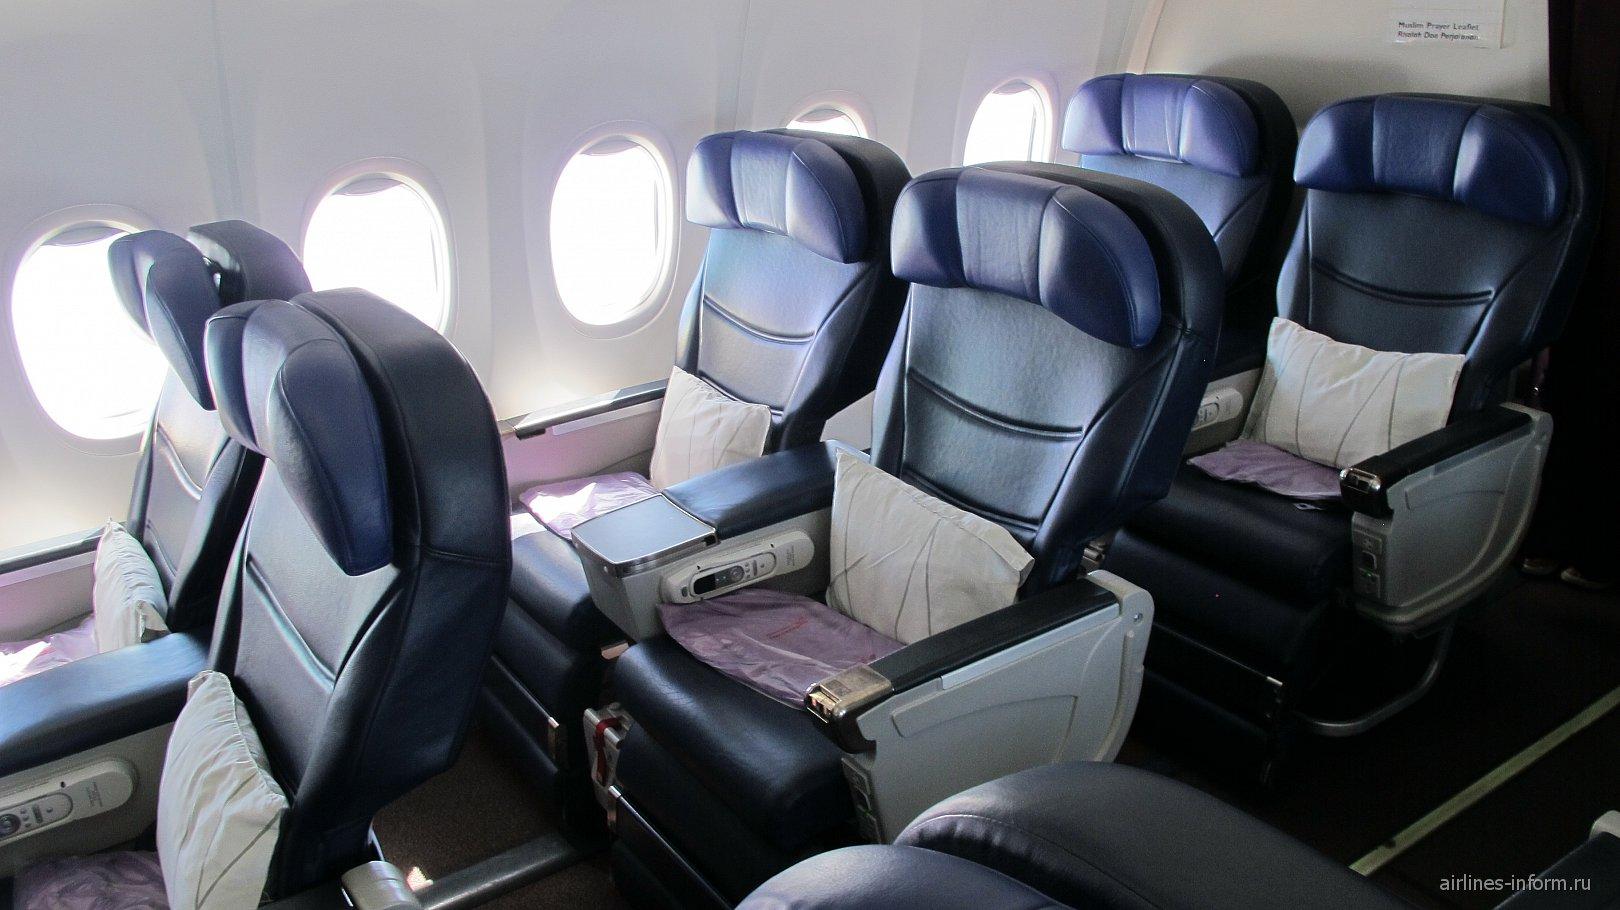 Салон бизнес-класса в Боинге-737-800 Малайзийских авиалиний